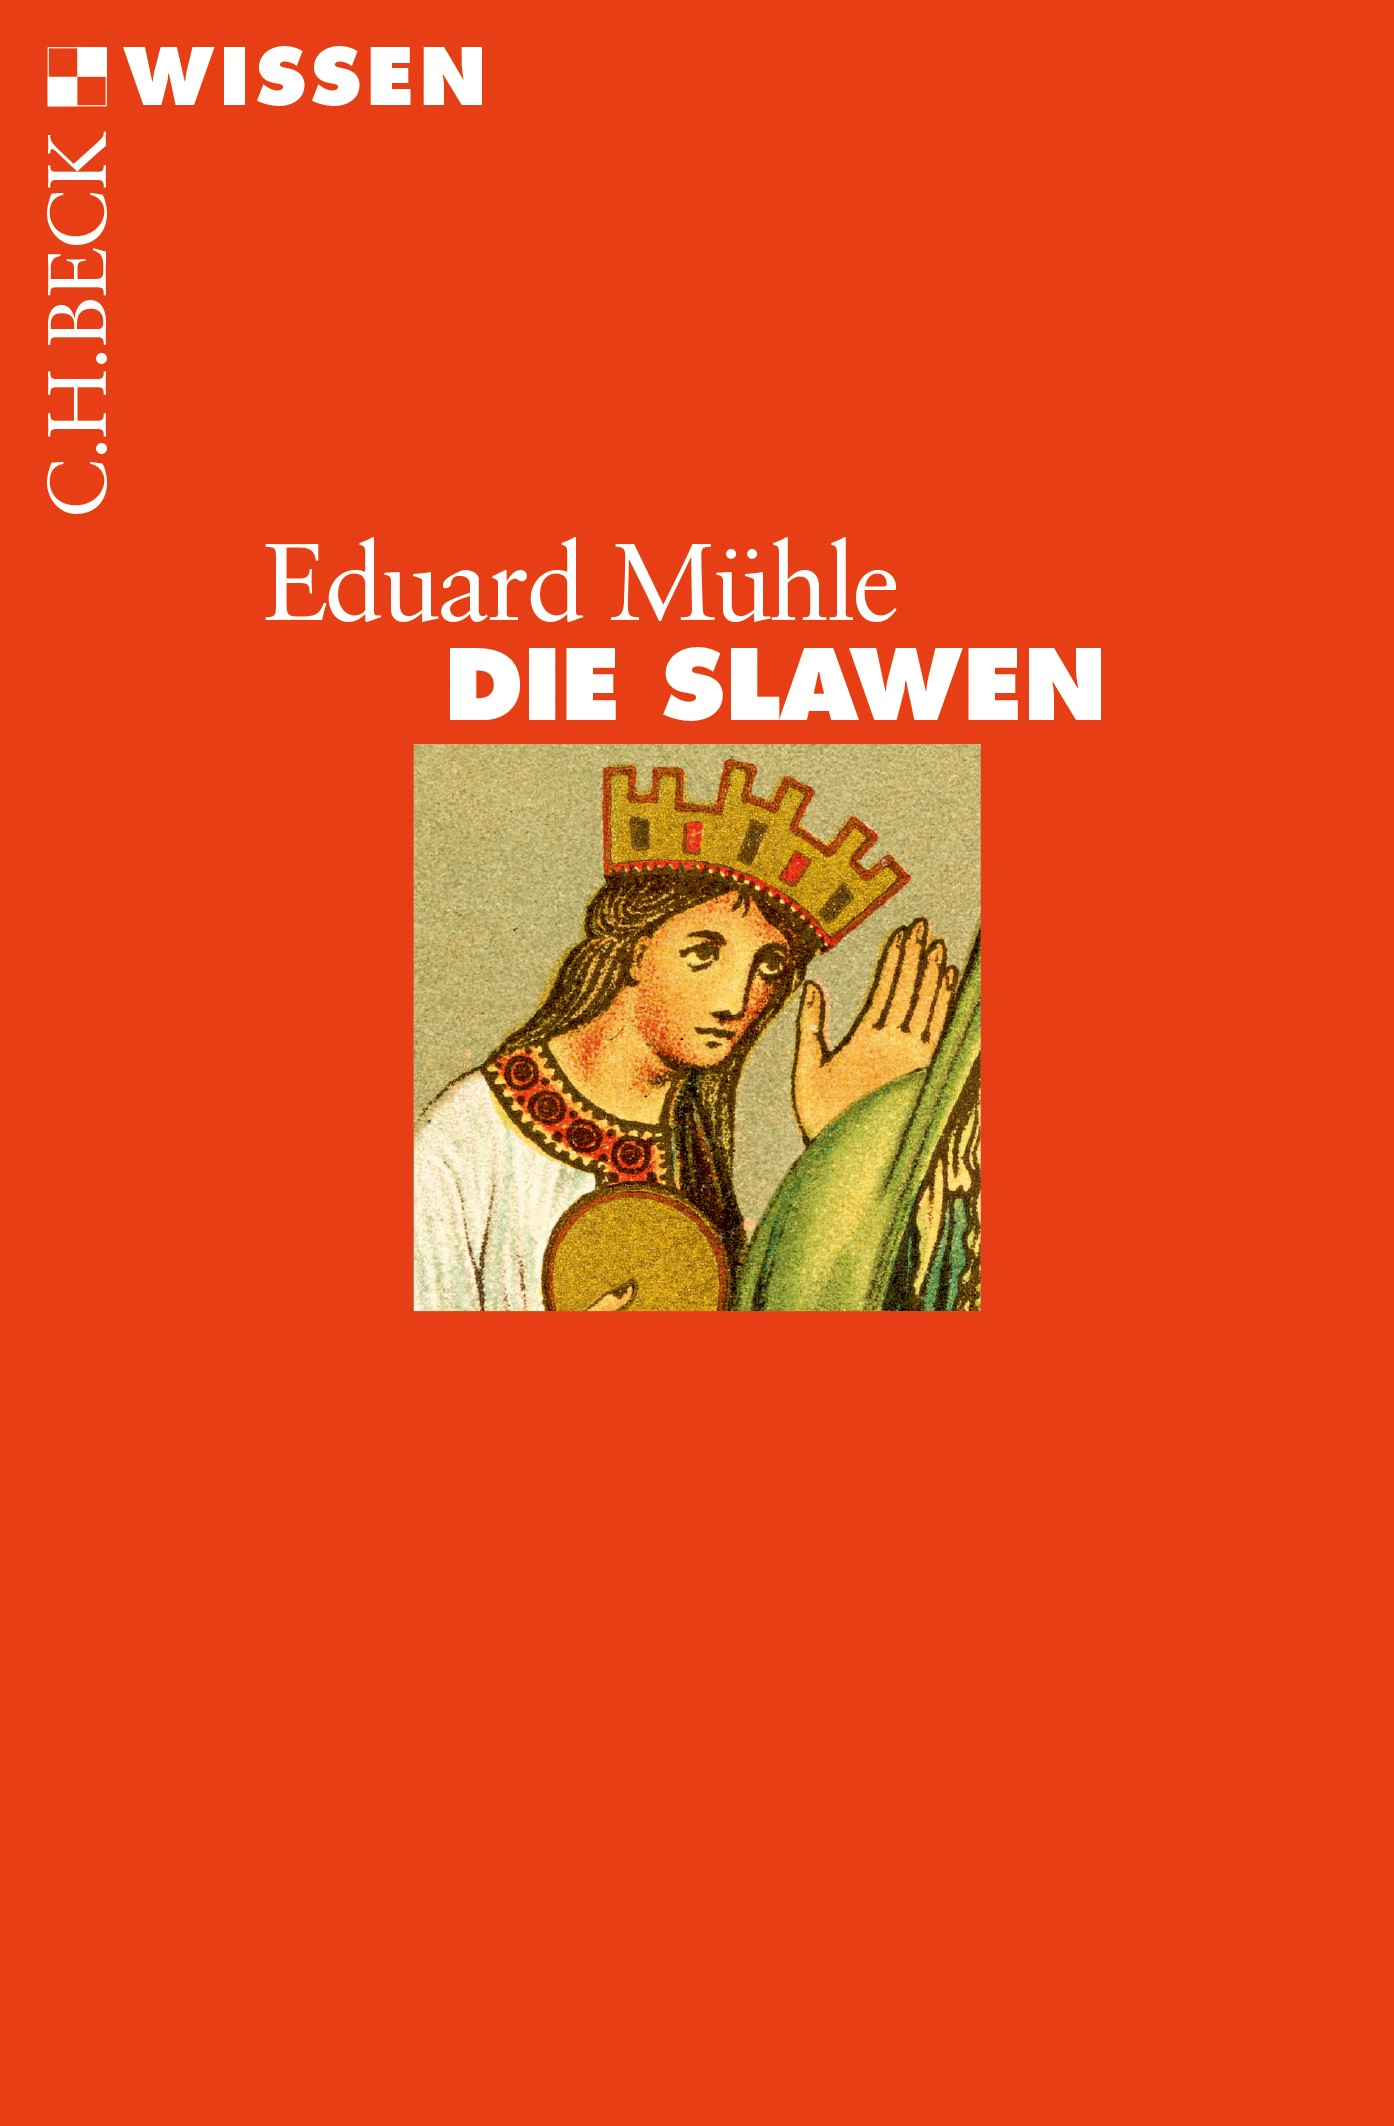 Die Slawen   Mühle, Eduard, 2017   Buch (Cover)